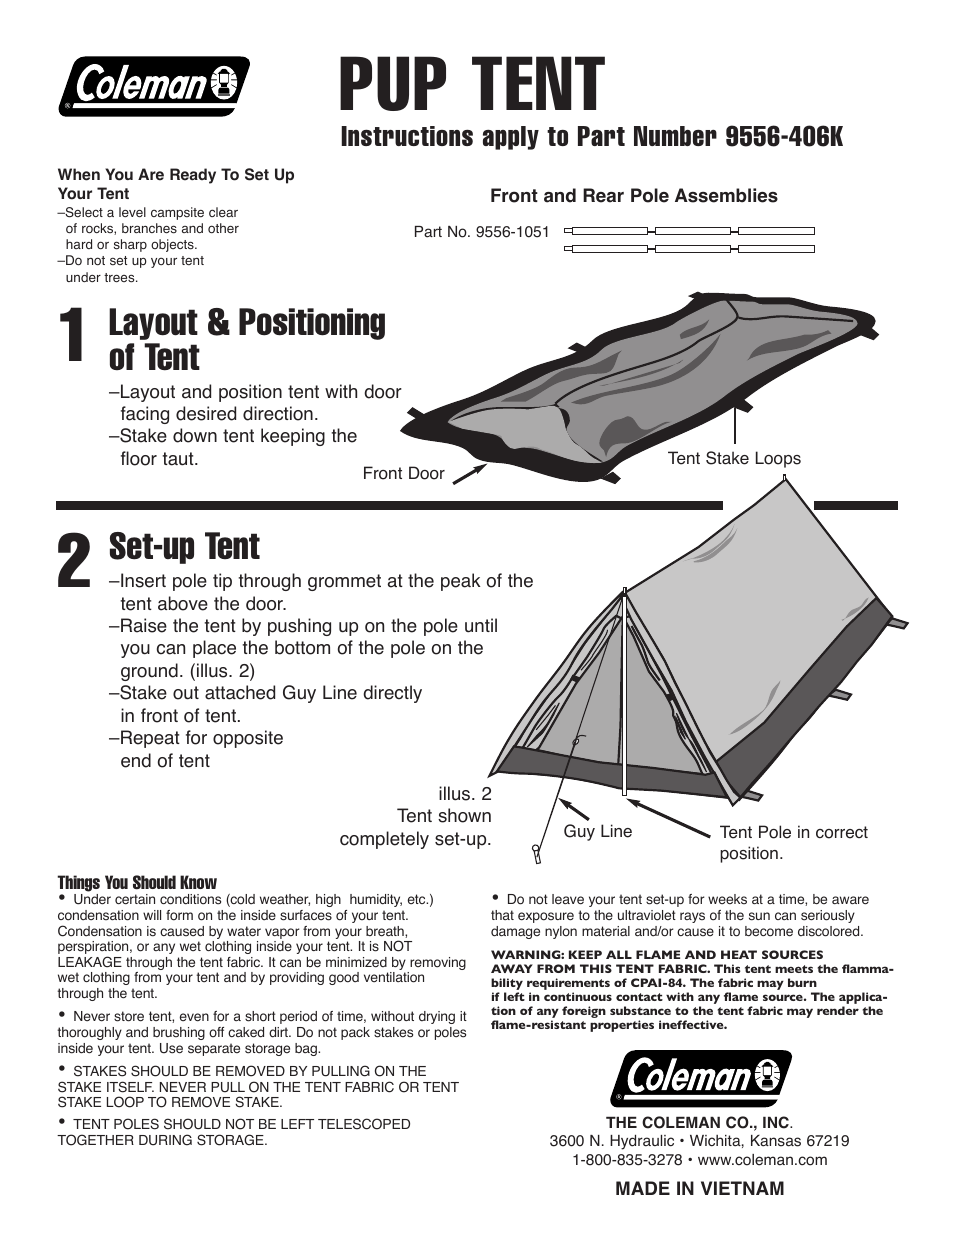 Coleman Pup Tent & View Larger